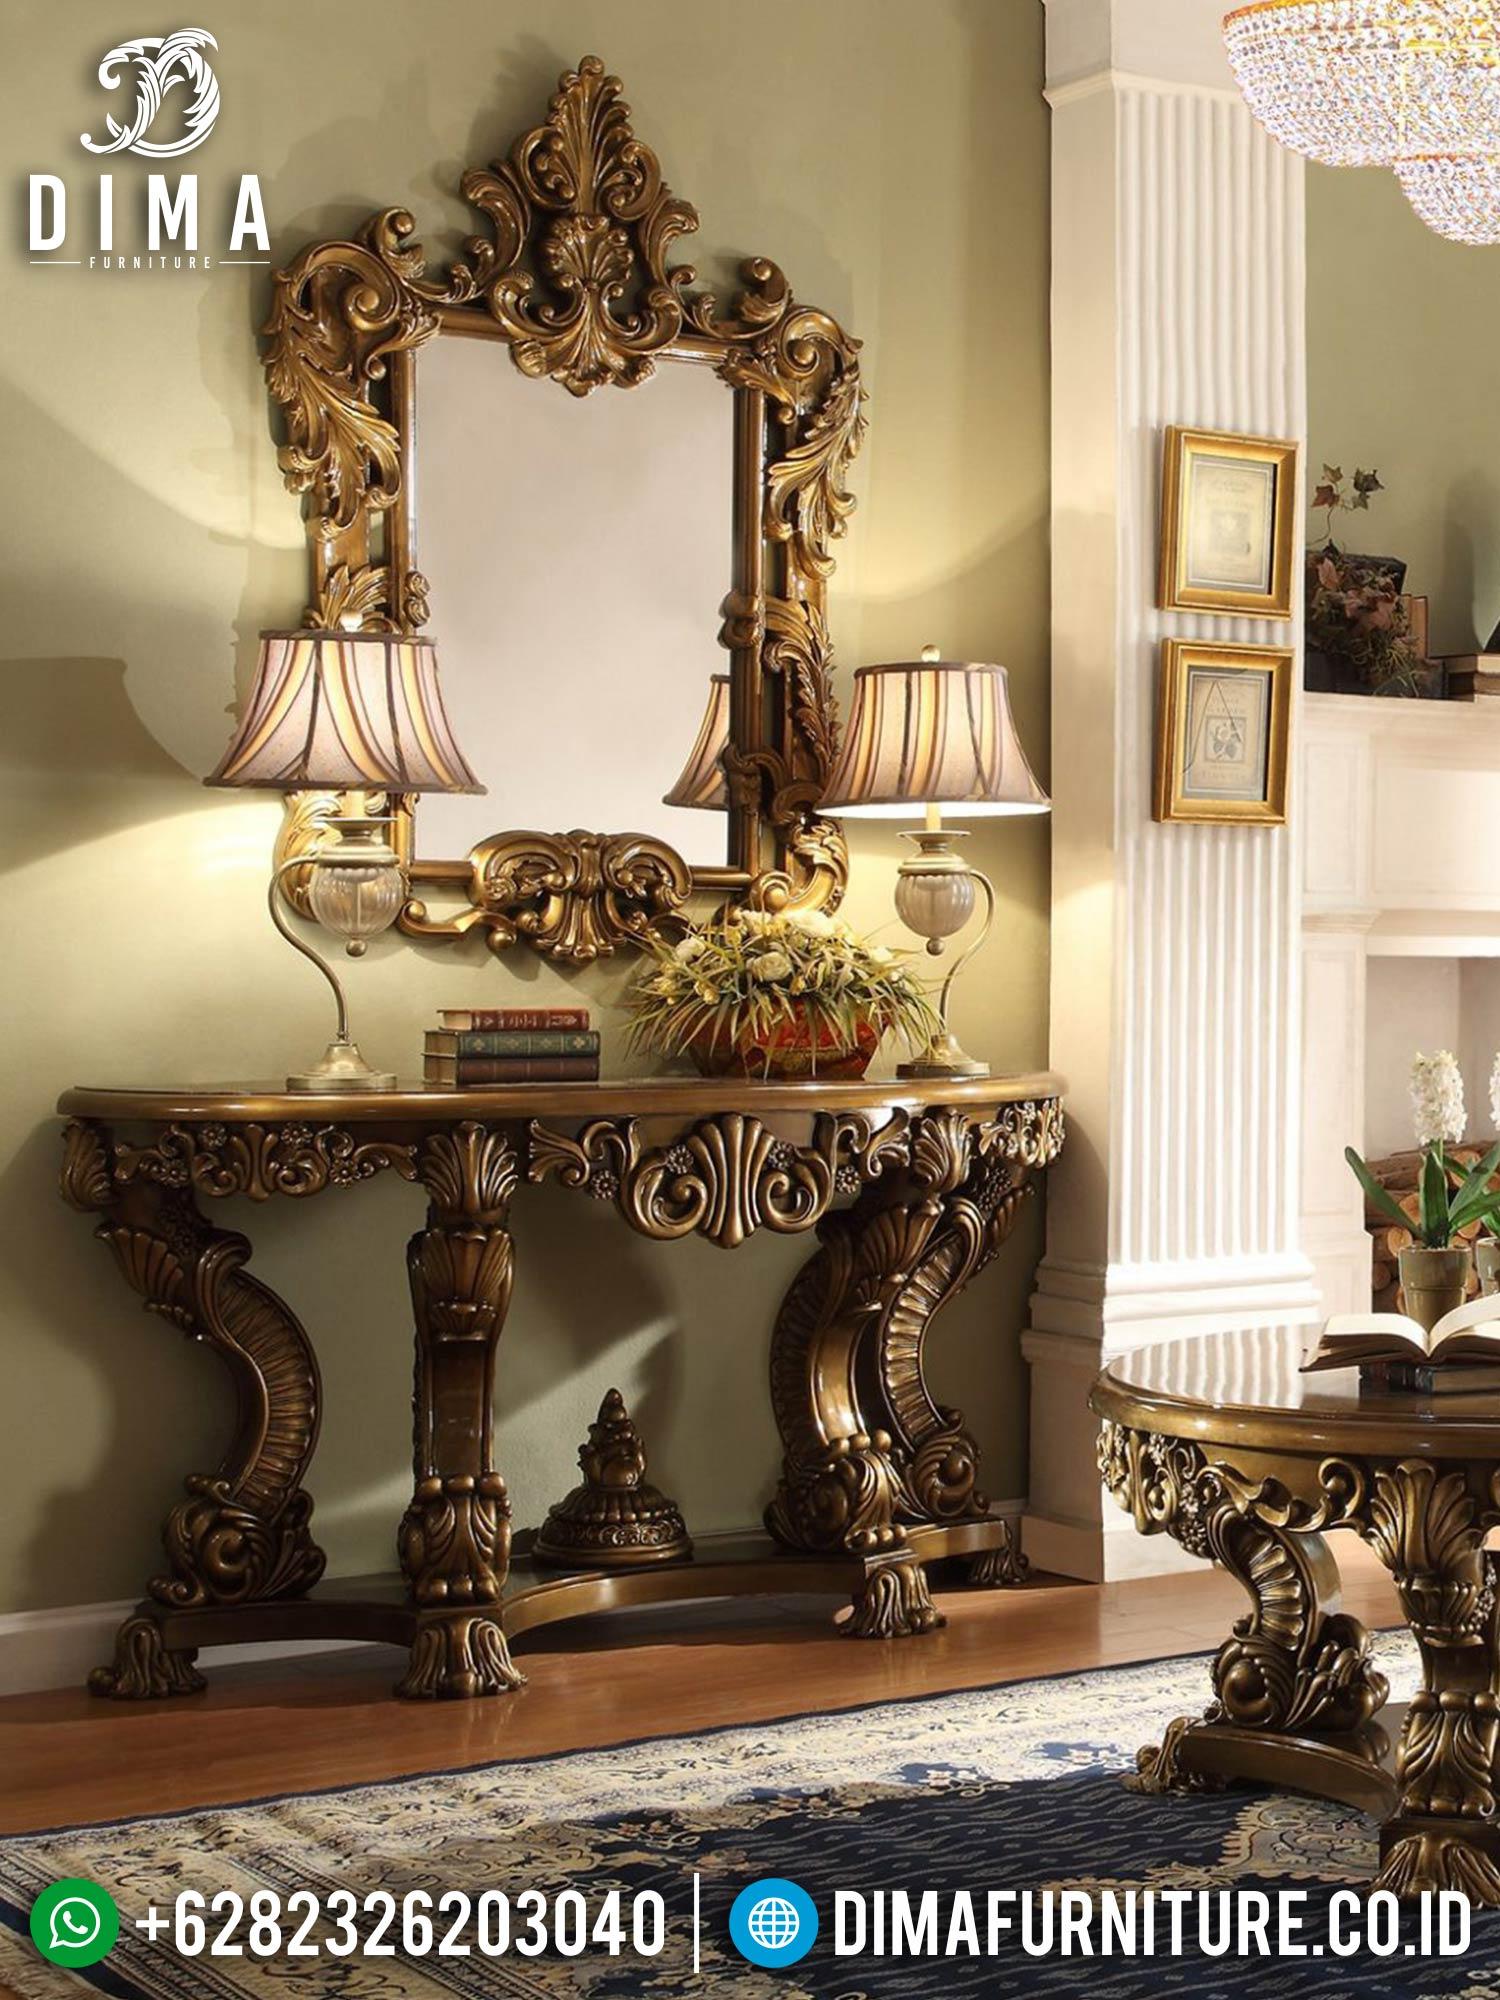 Great Style Meja Konsol Mewah Luxury Palace Design Italian Carving ST-1341